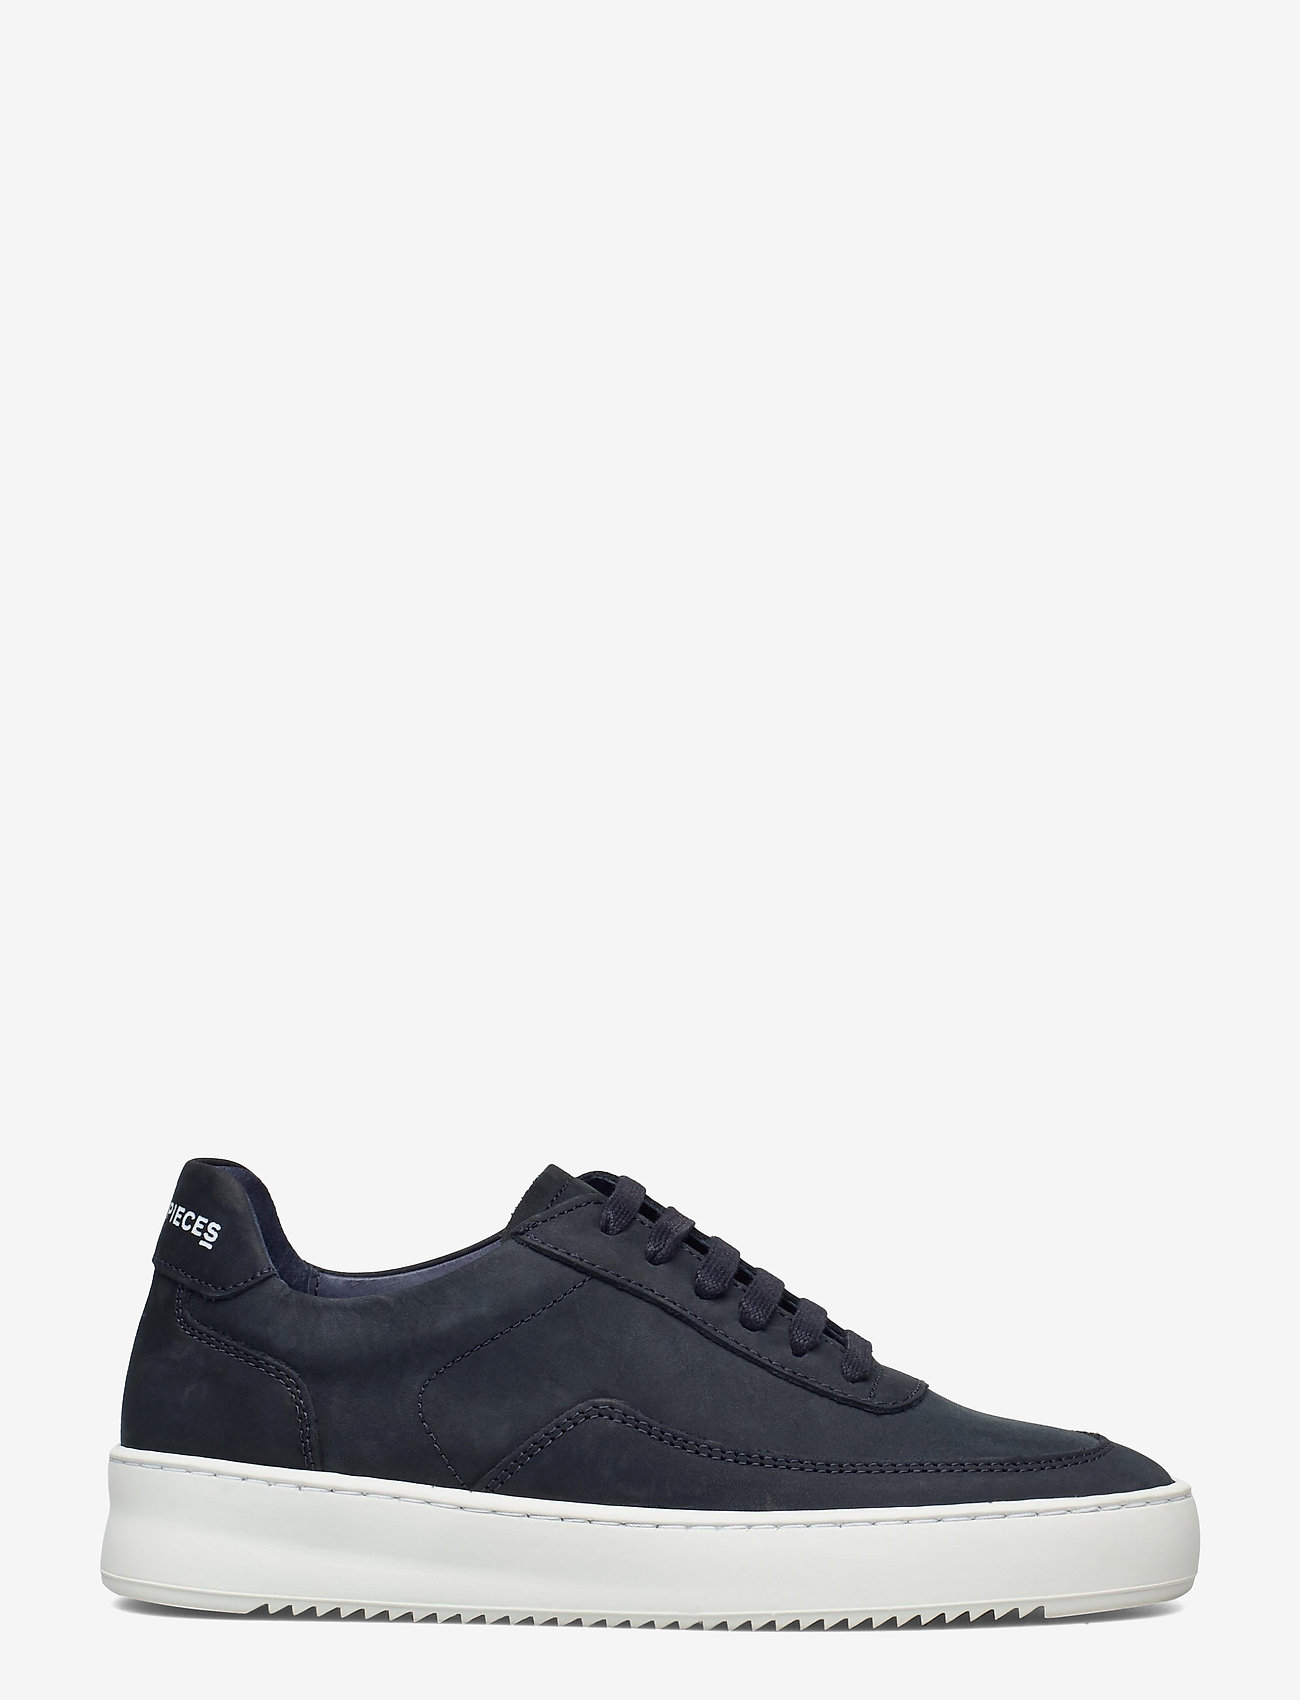 Filling Pieces - Mondo 2.0 Ripple Nubuck - låga sneakers - navy blue - 0